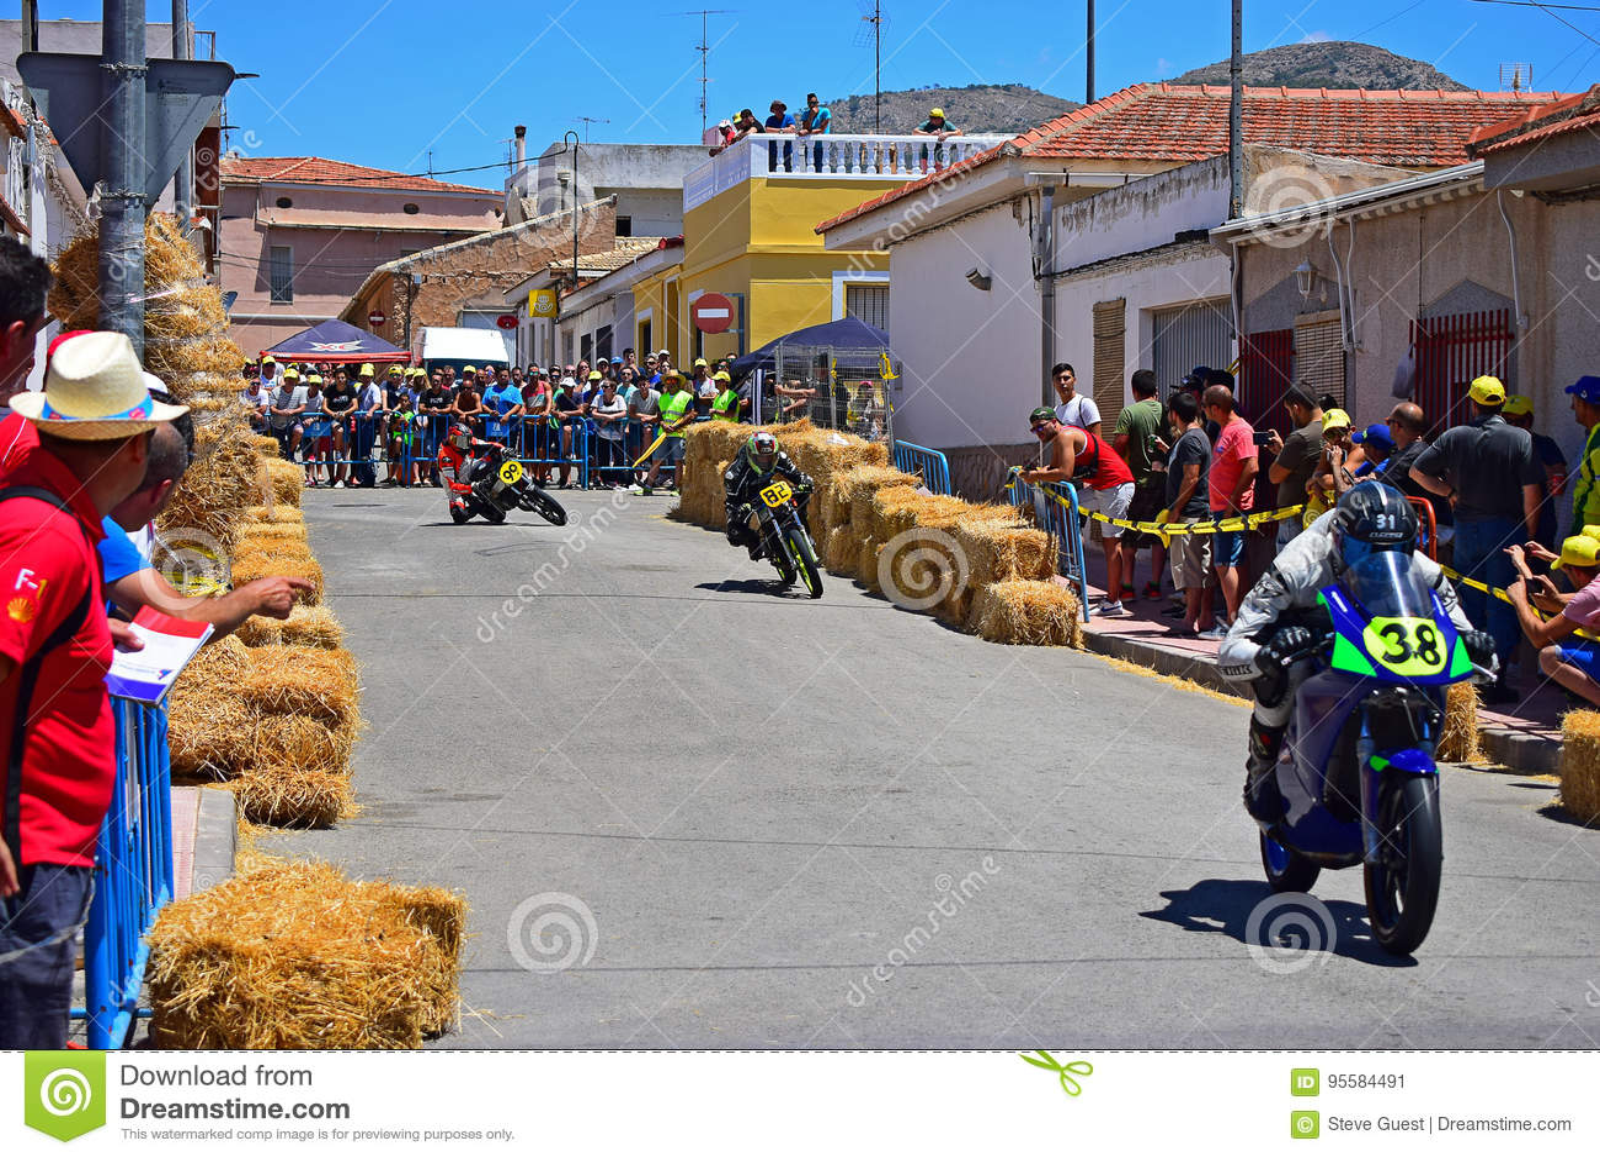 Motorcycle Street Race